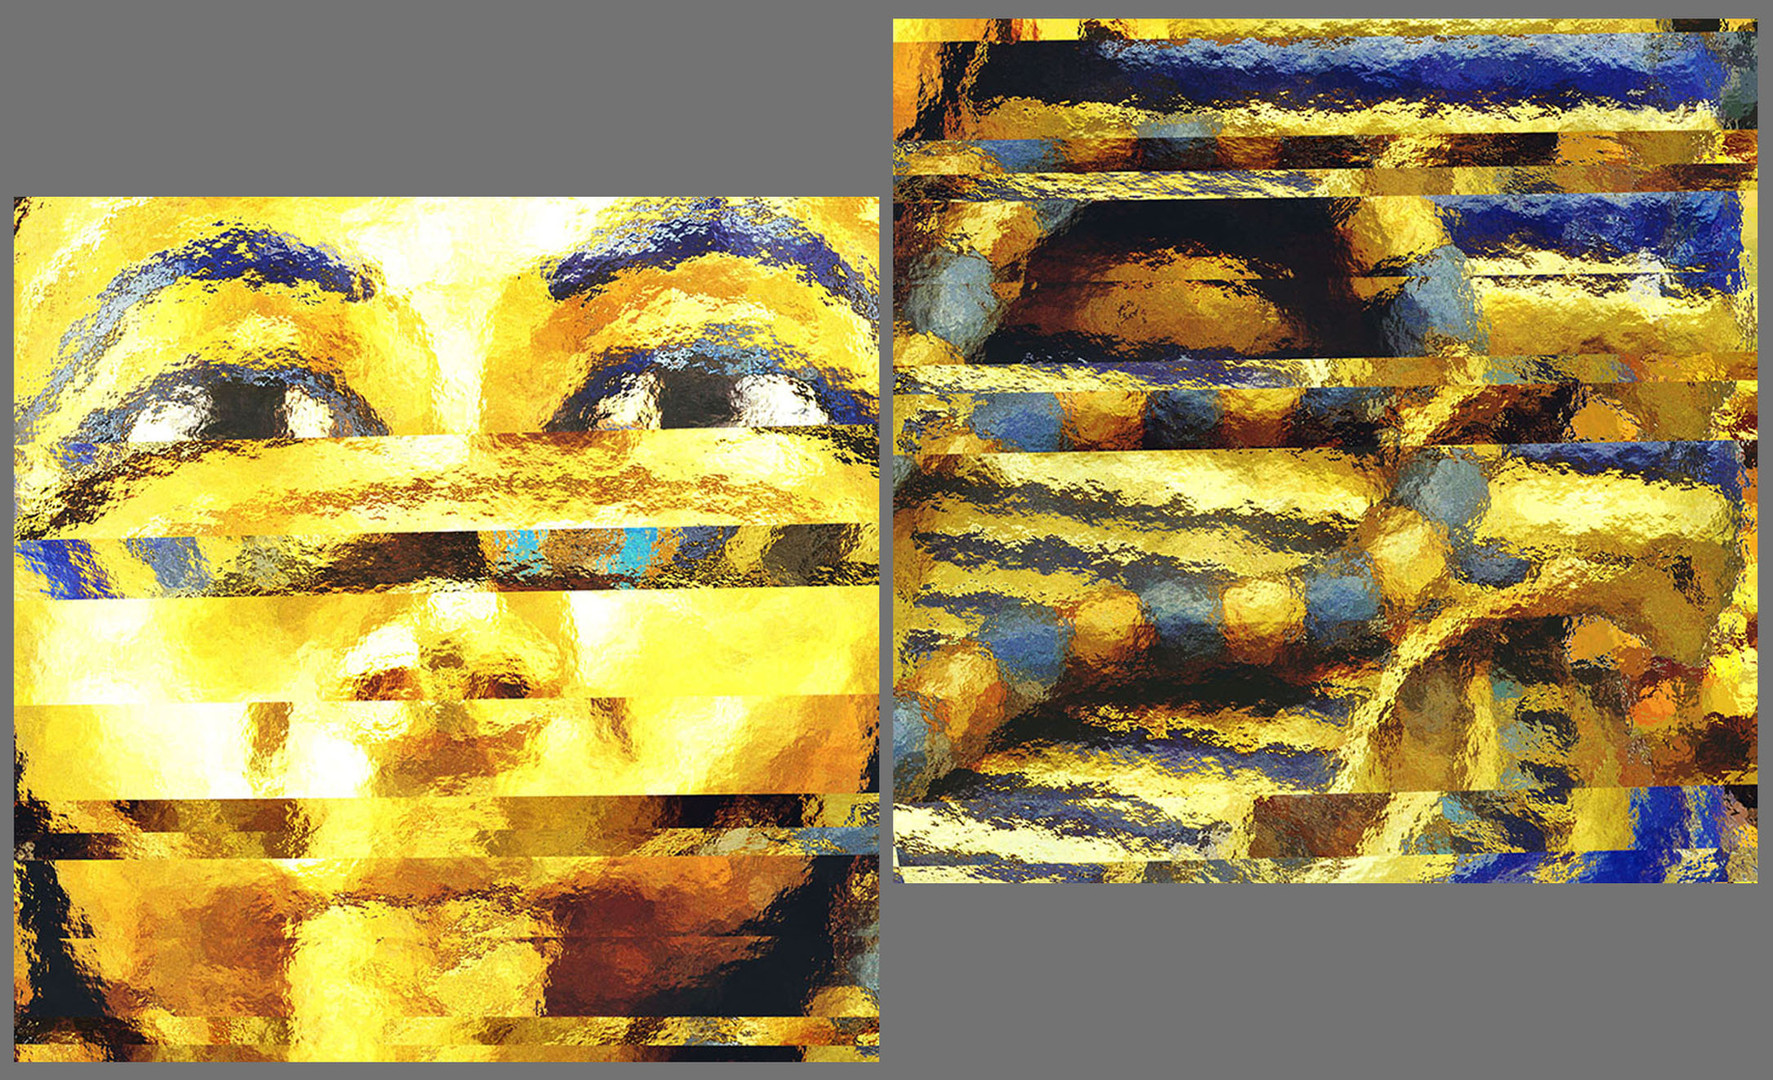 Giclée-Thout01-close-up02.jpg